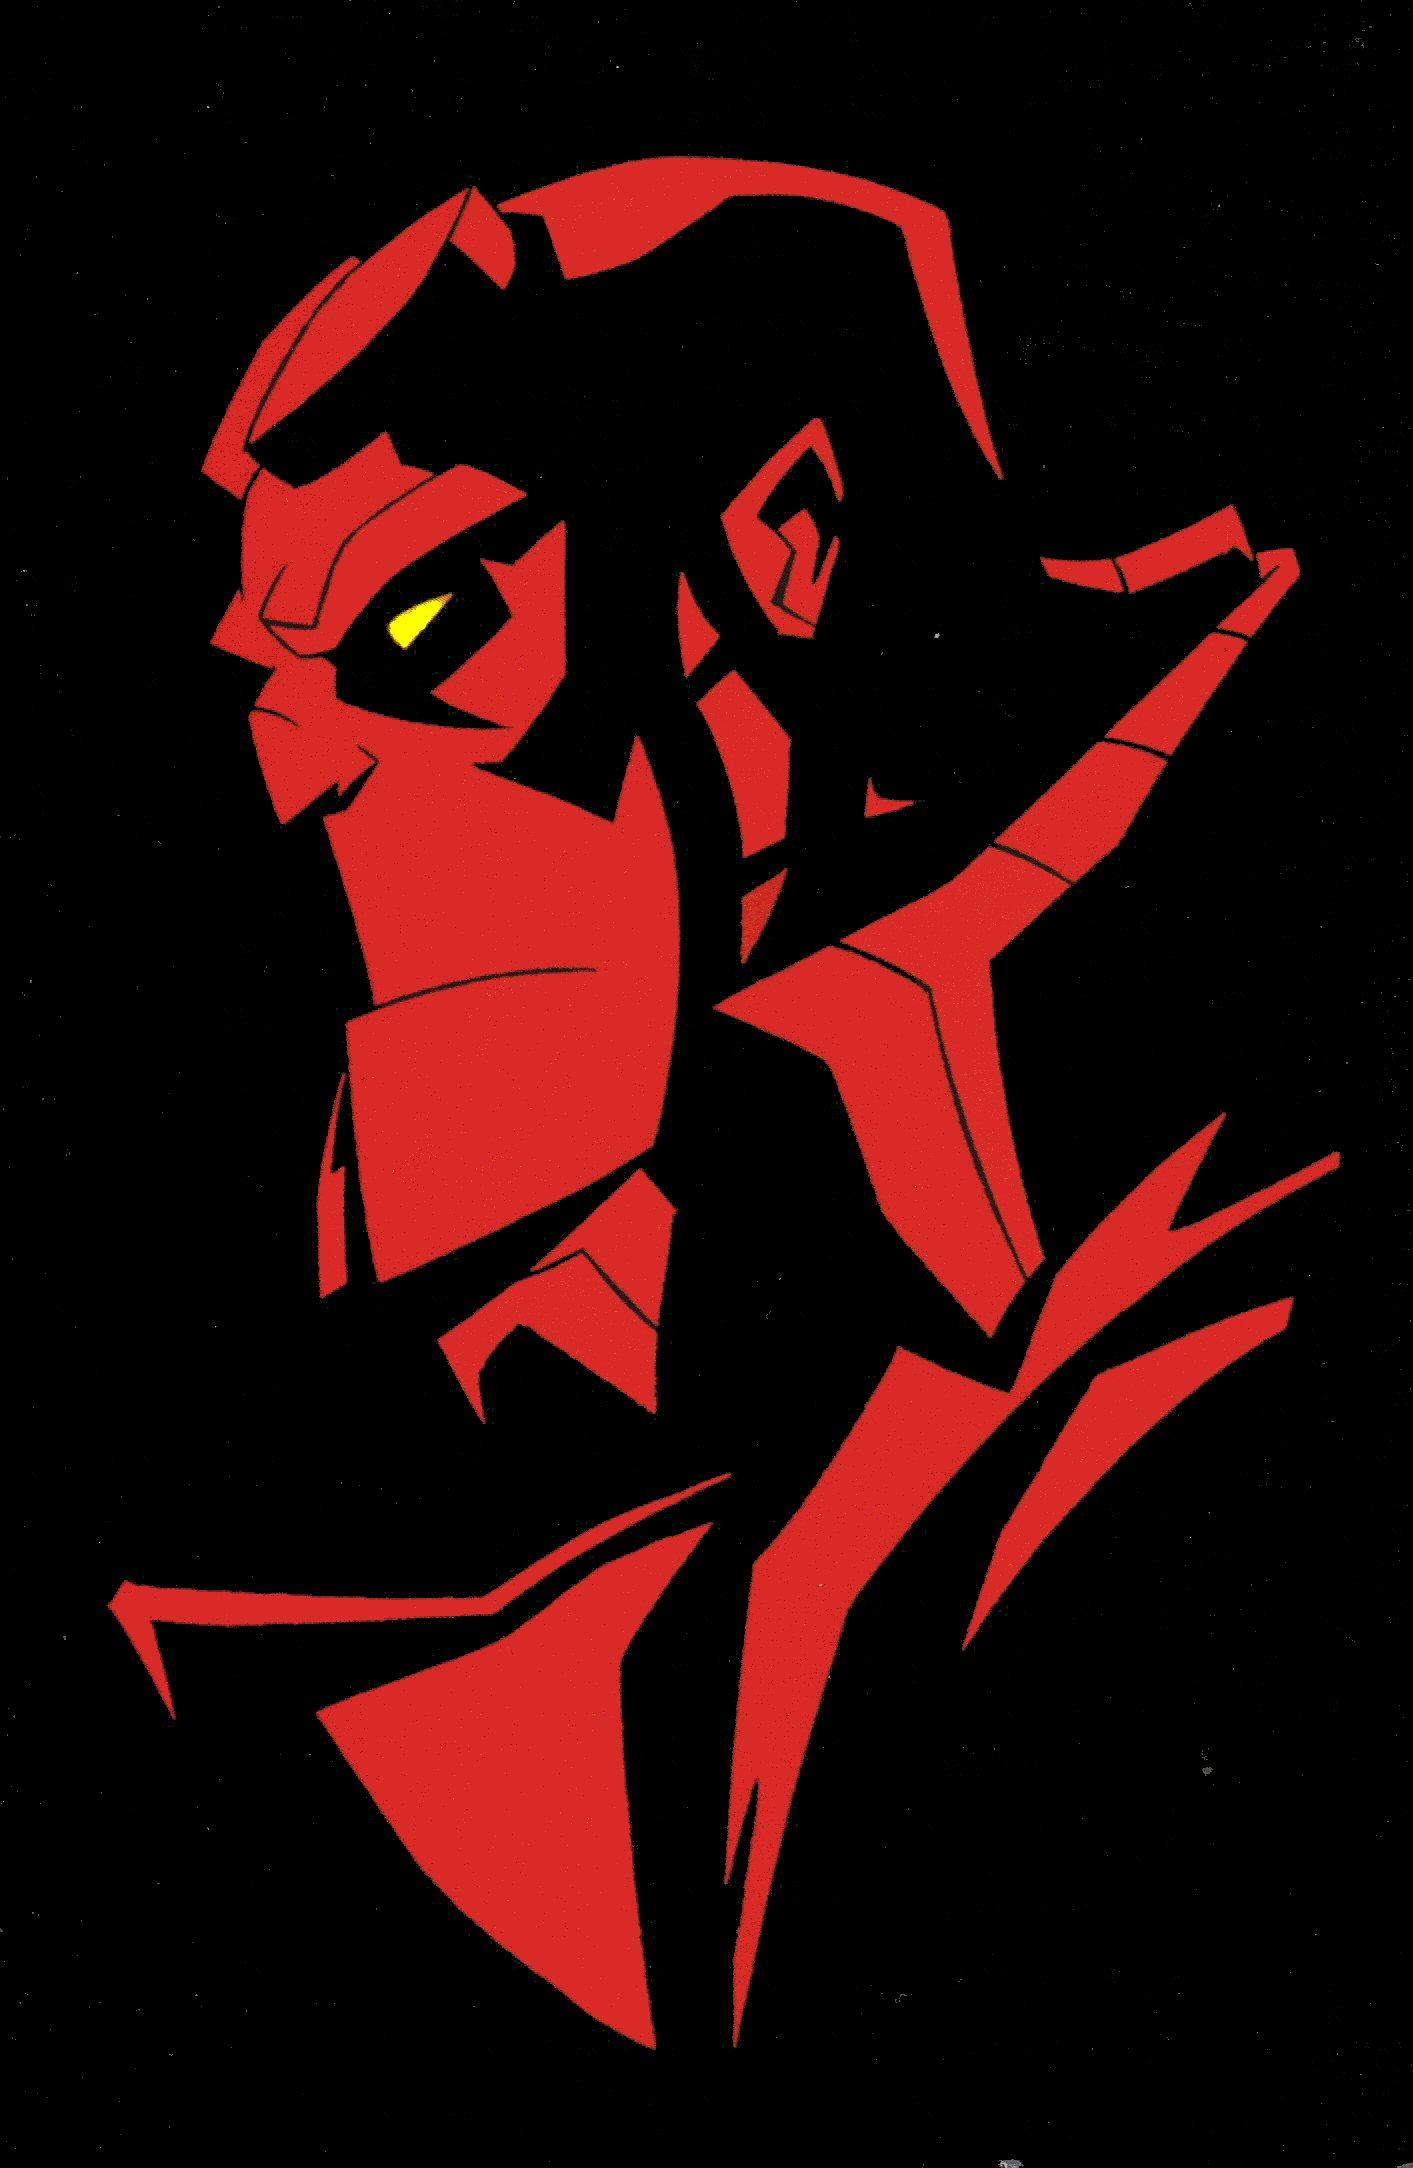 Download The Hellboy Wallpaper Hellboy Iphone Wallpaper Hellboy